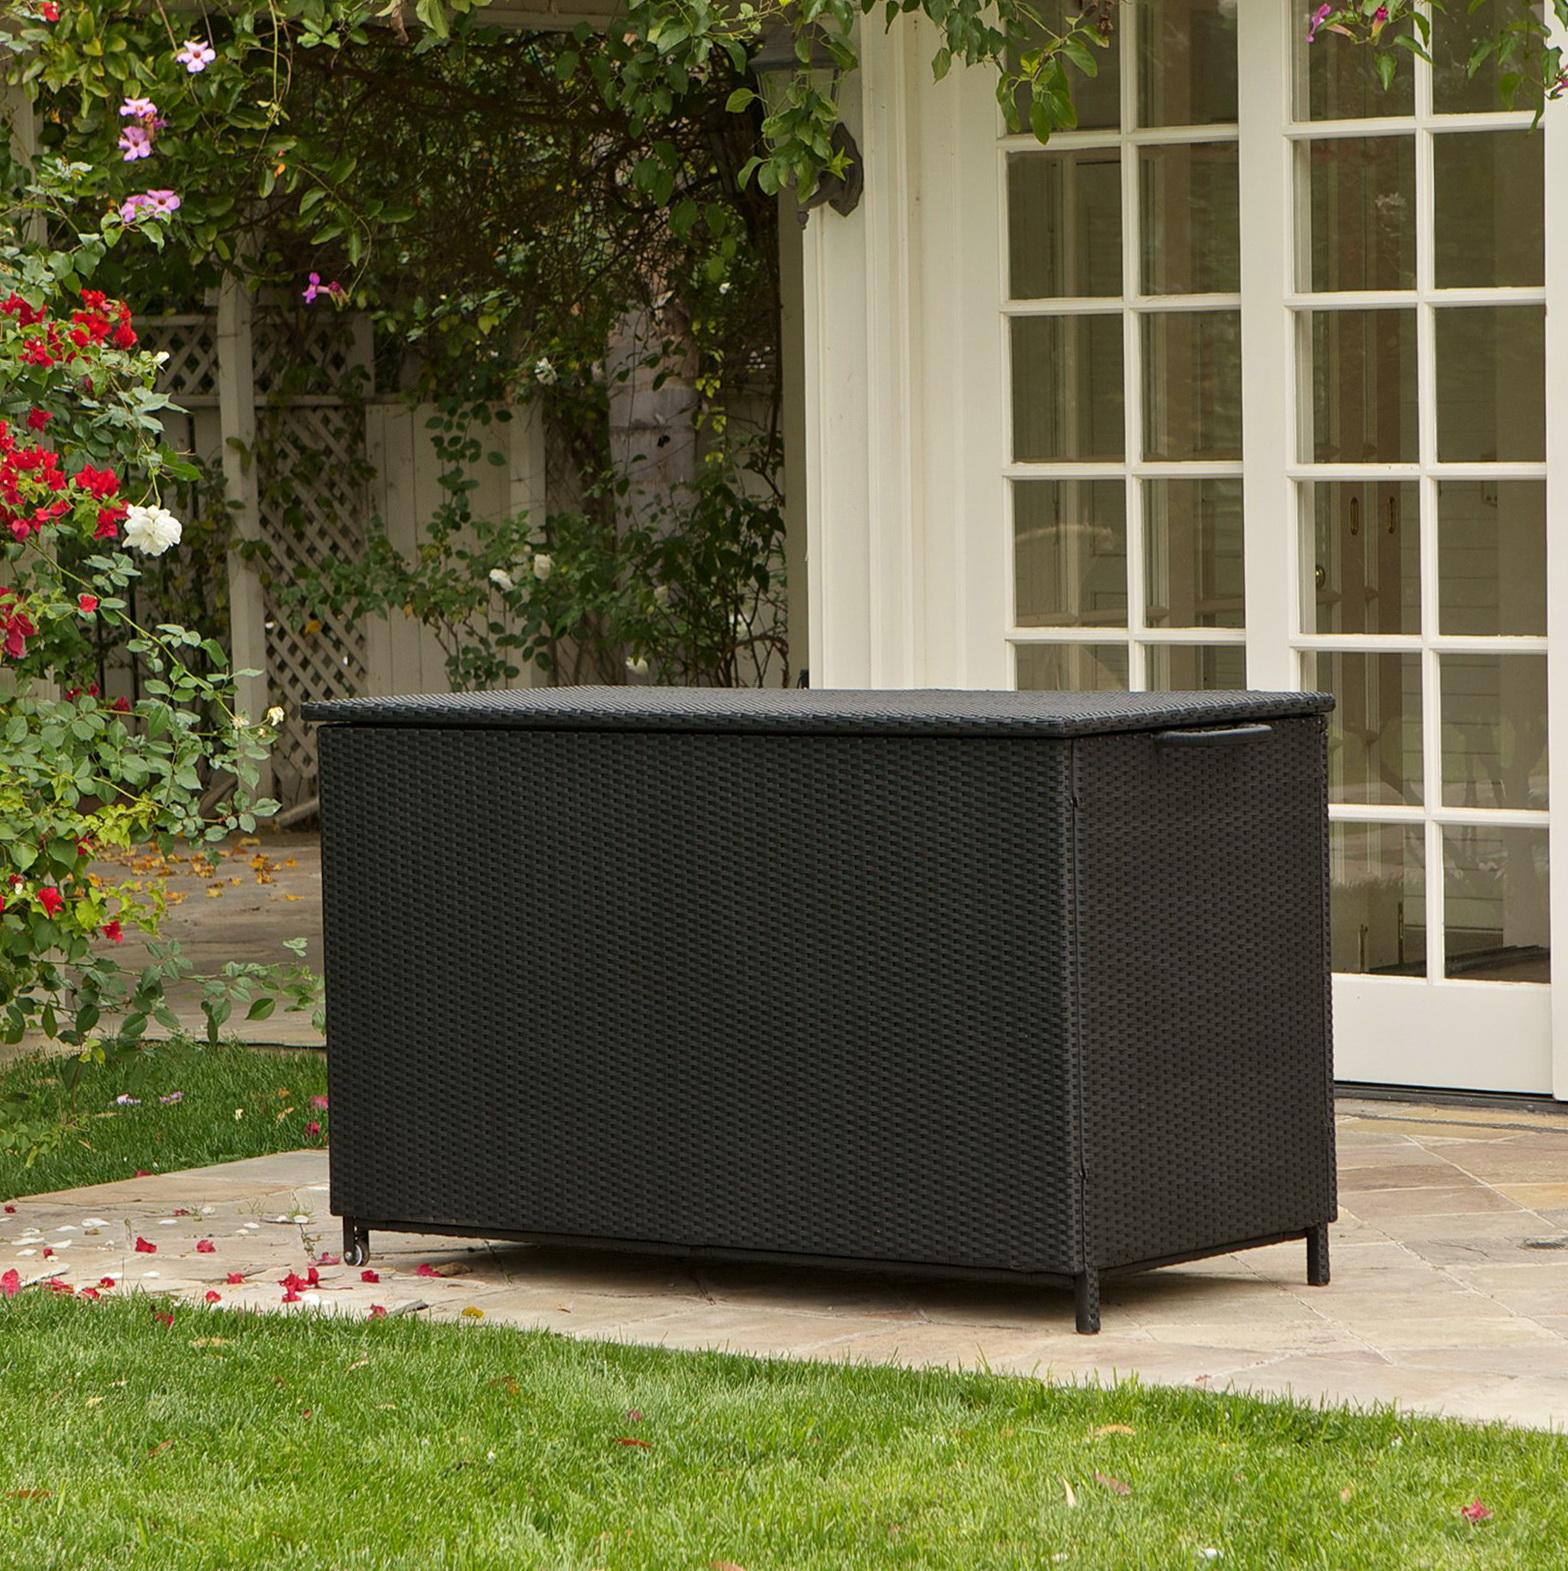 Black Deck Box Bench Home Design Ideas